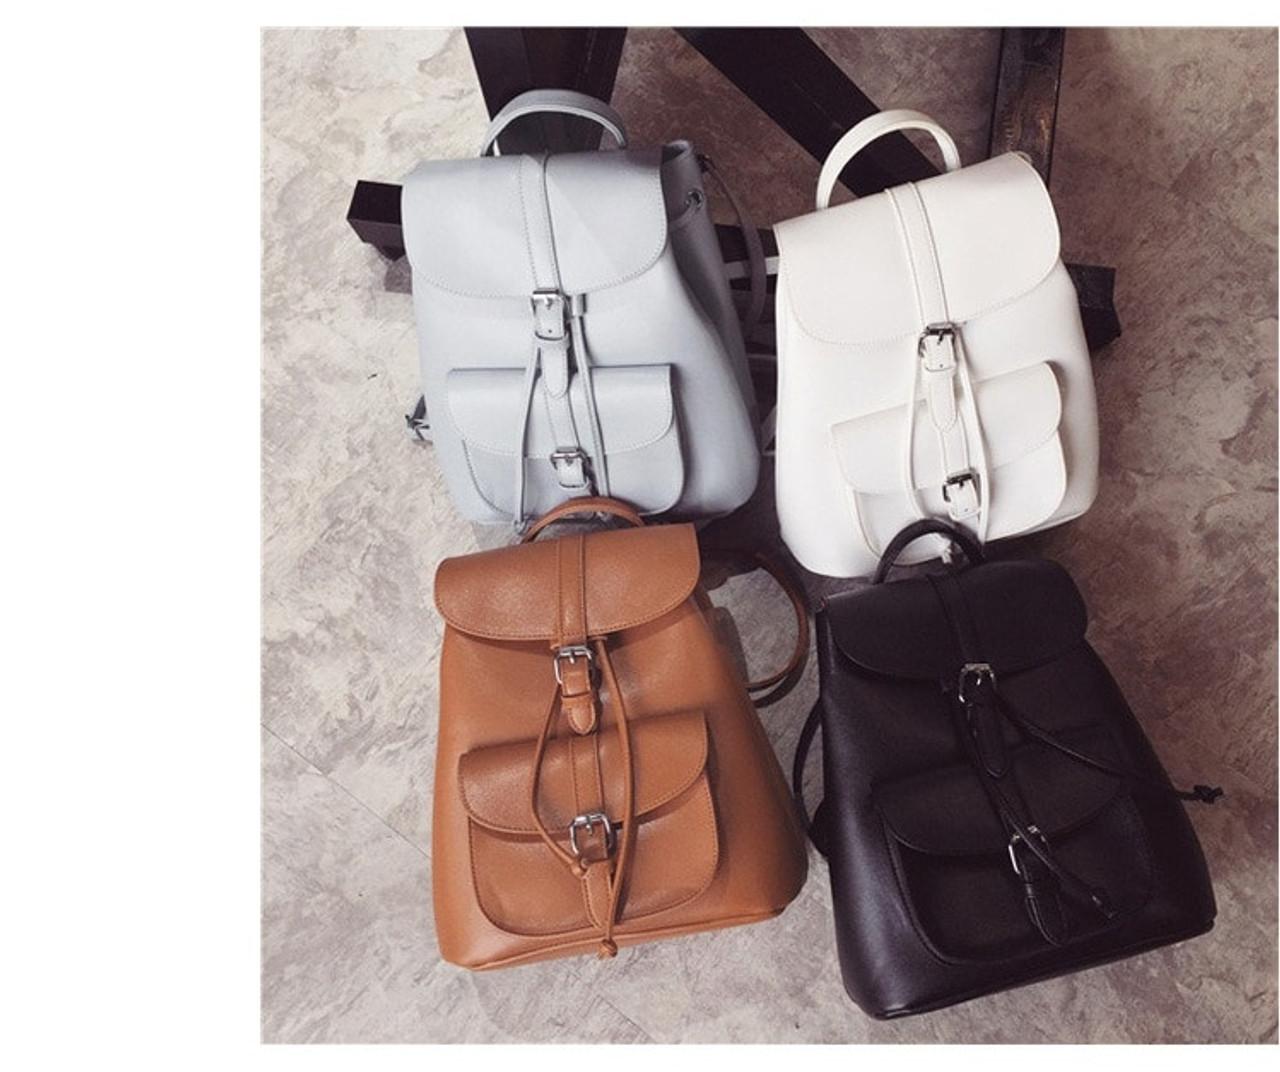 06d2be734b ... Miyahouse High Quality Women Drawstring Backpacks Trendy Teenager Girls  Mini Shoulder School Bag Female Leisure Travel ...